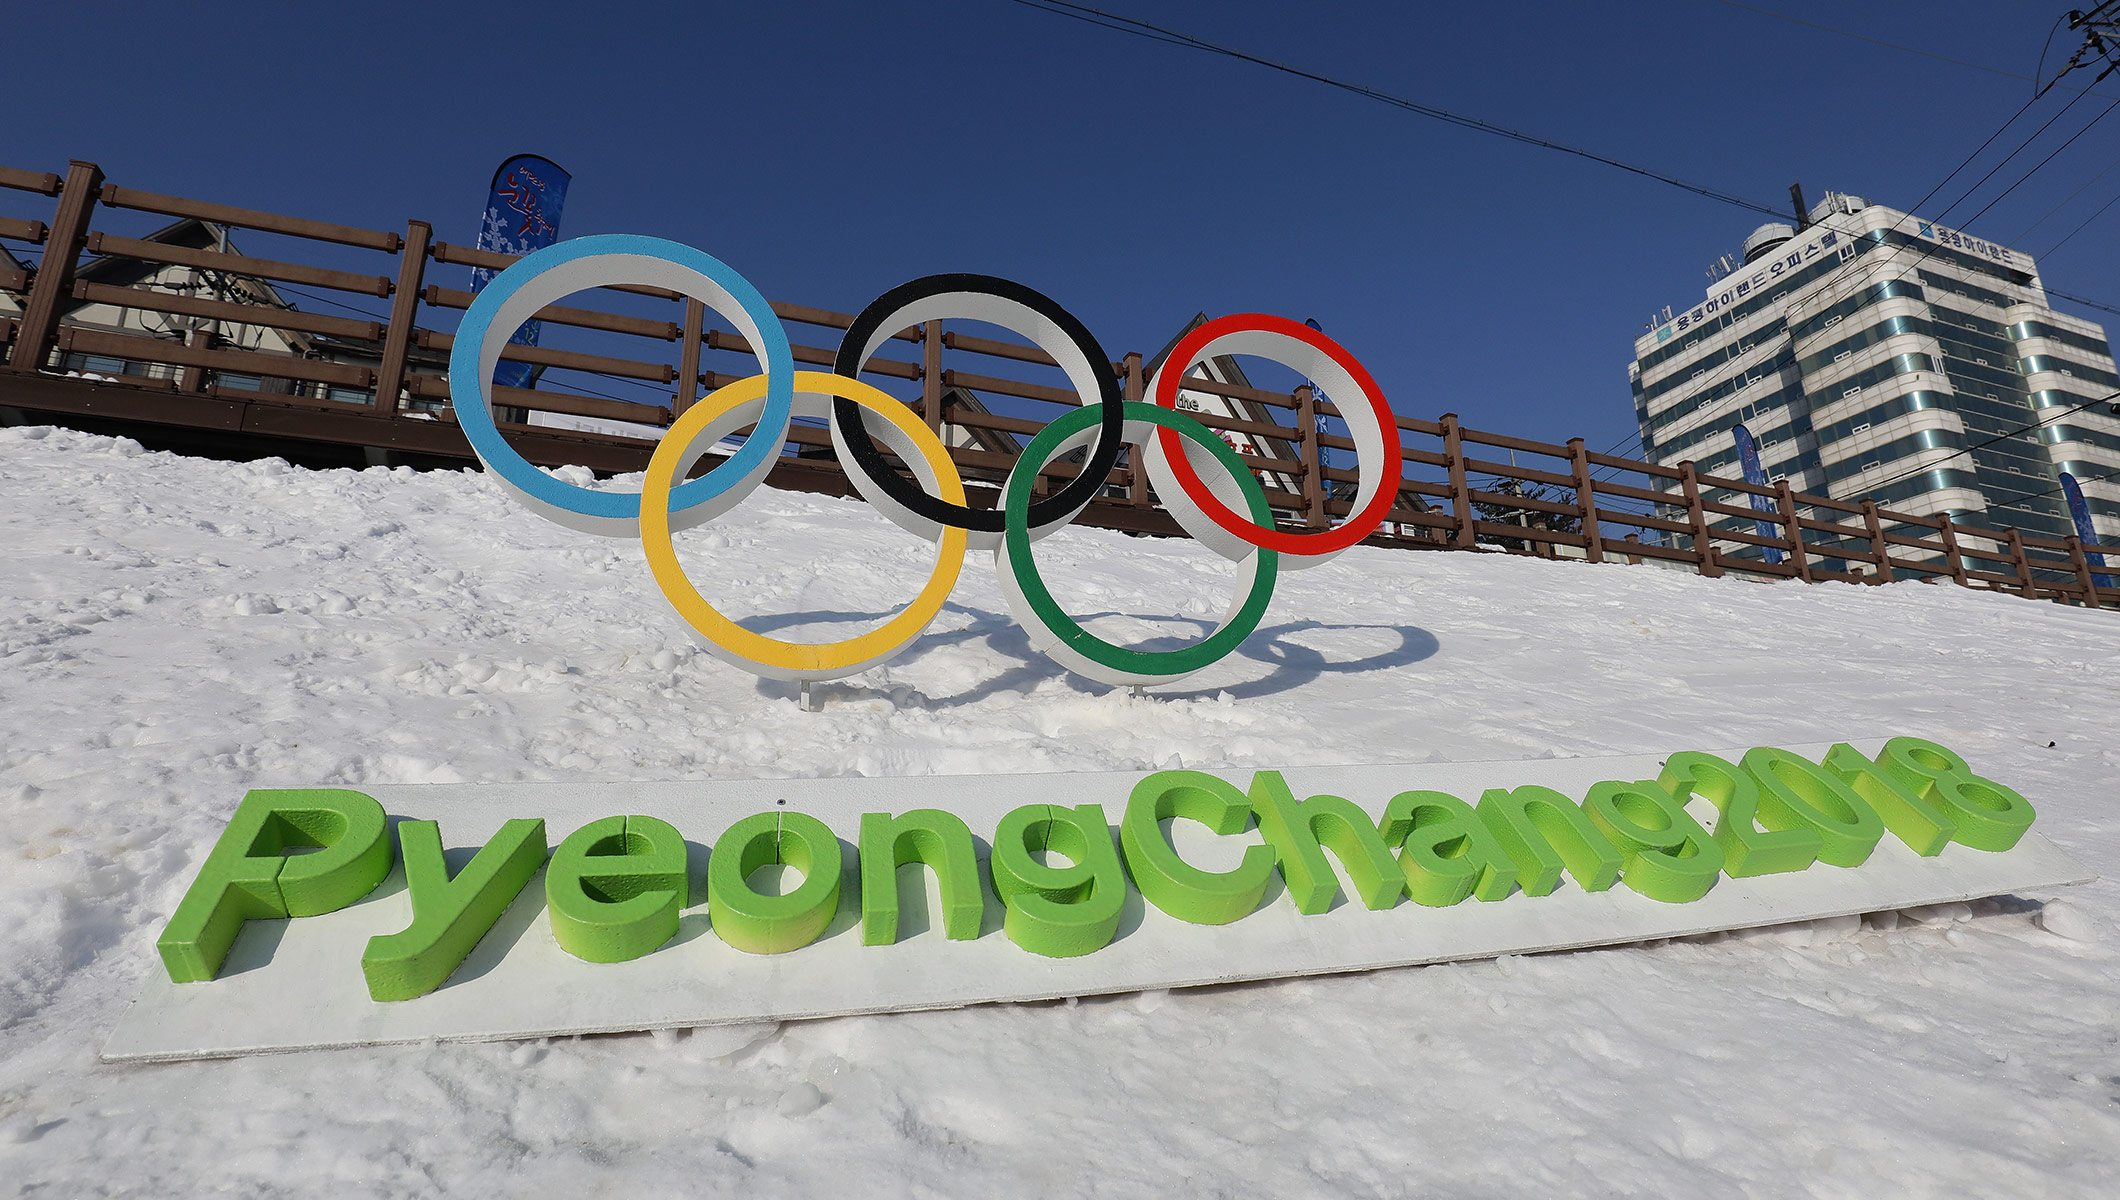 Winter Olympics PyeongChang South Korea